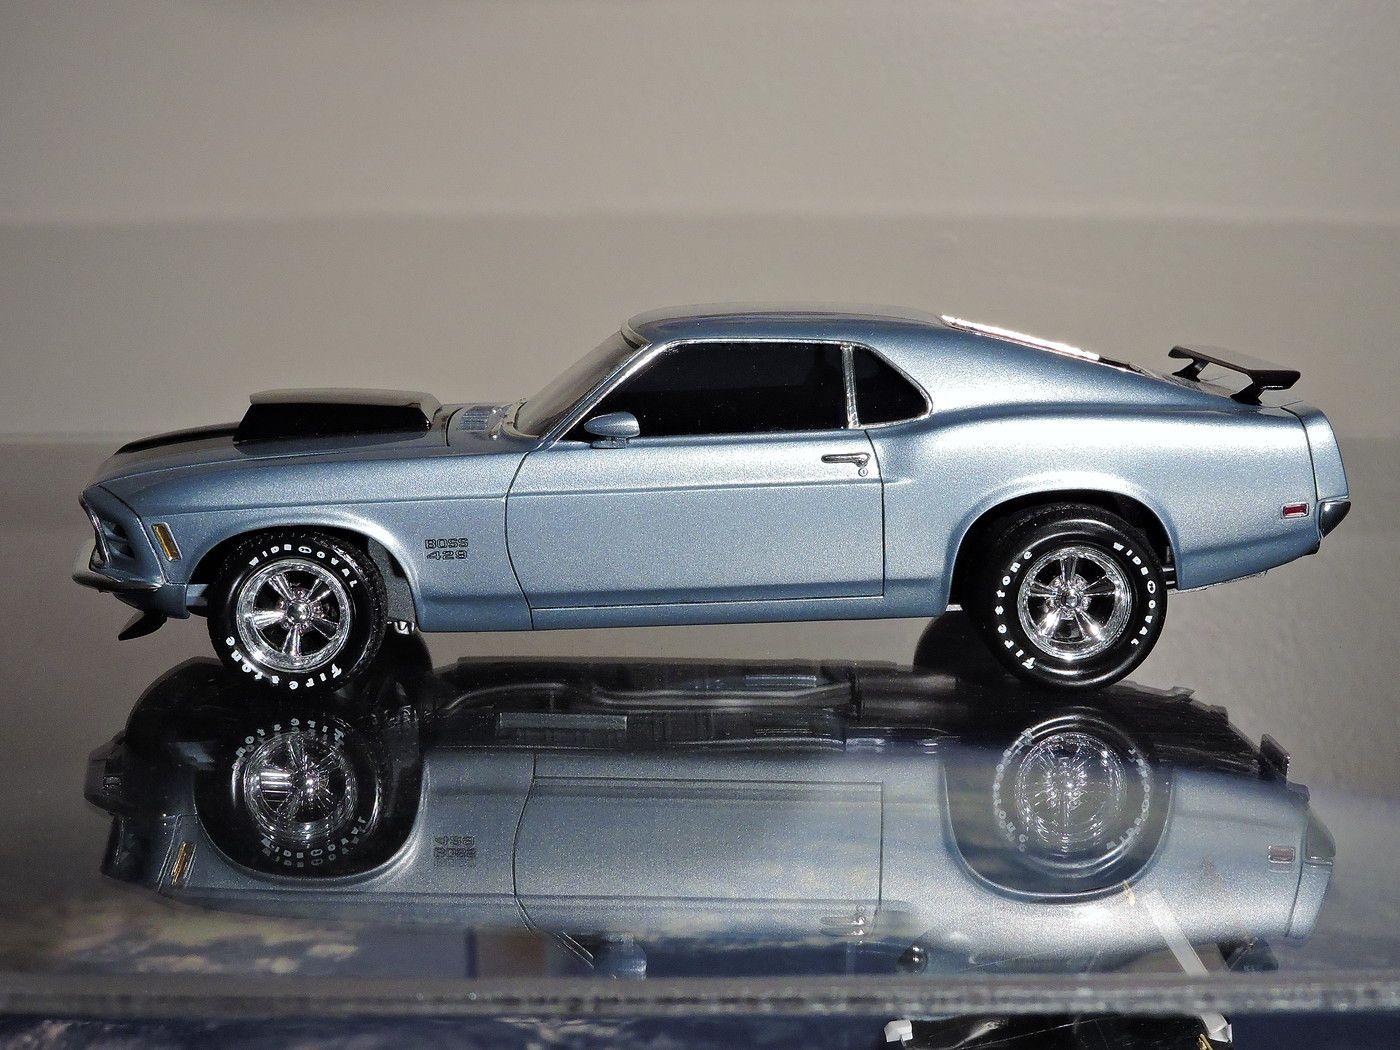 revell 1970 mustang boss 429 scale model cars trucks 1. Black Bedroom Furniture Sets. Home Design Ideas